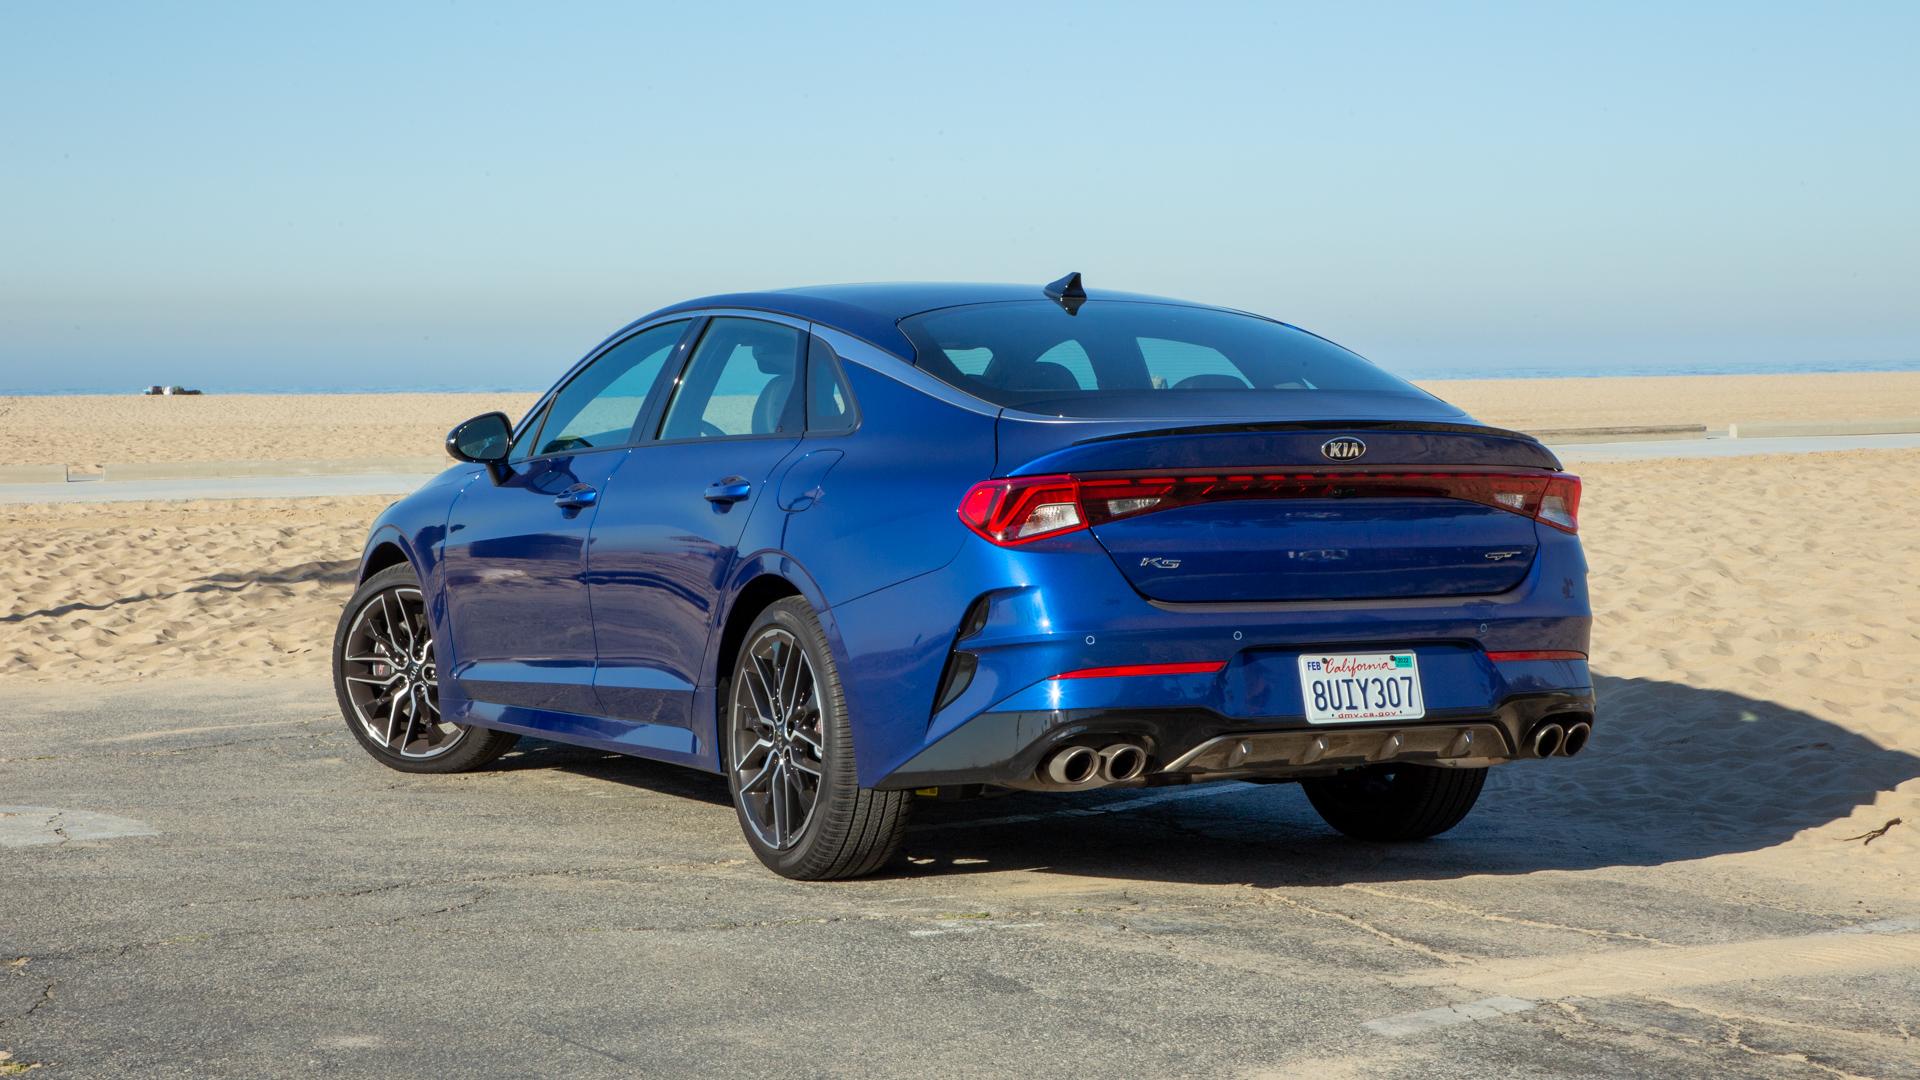 2021 Kia K5 GT, Hydrocar, Ford renews Splash trademark: Car News Headlines